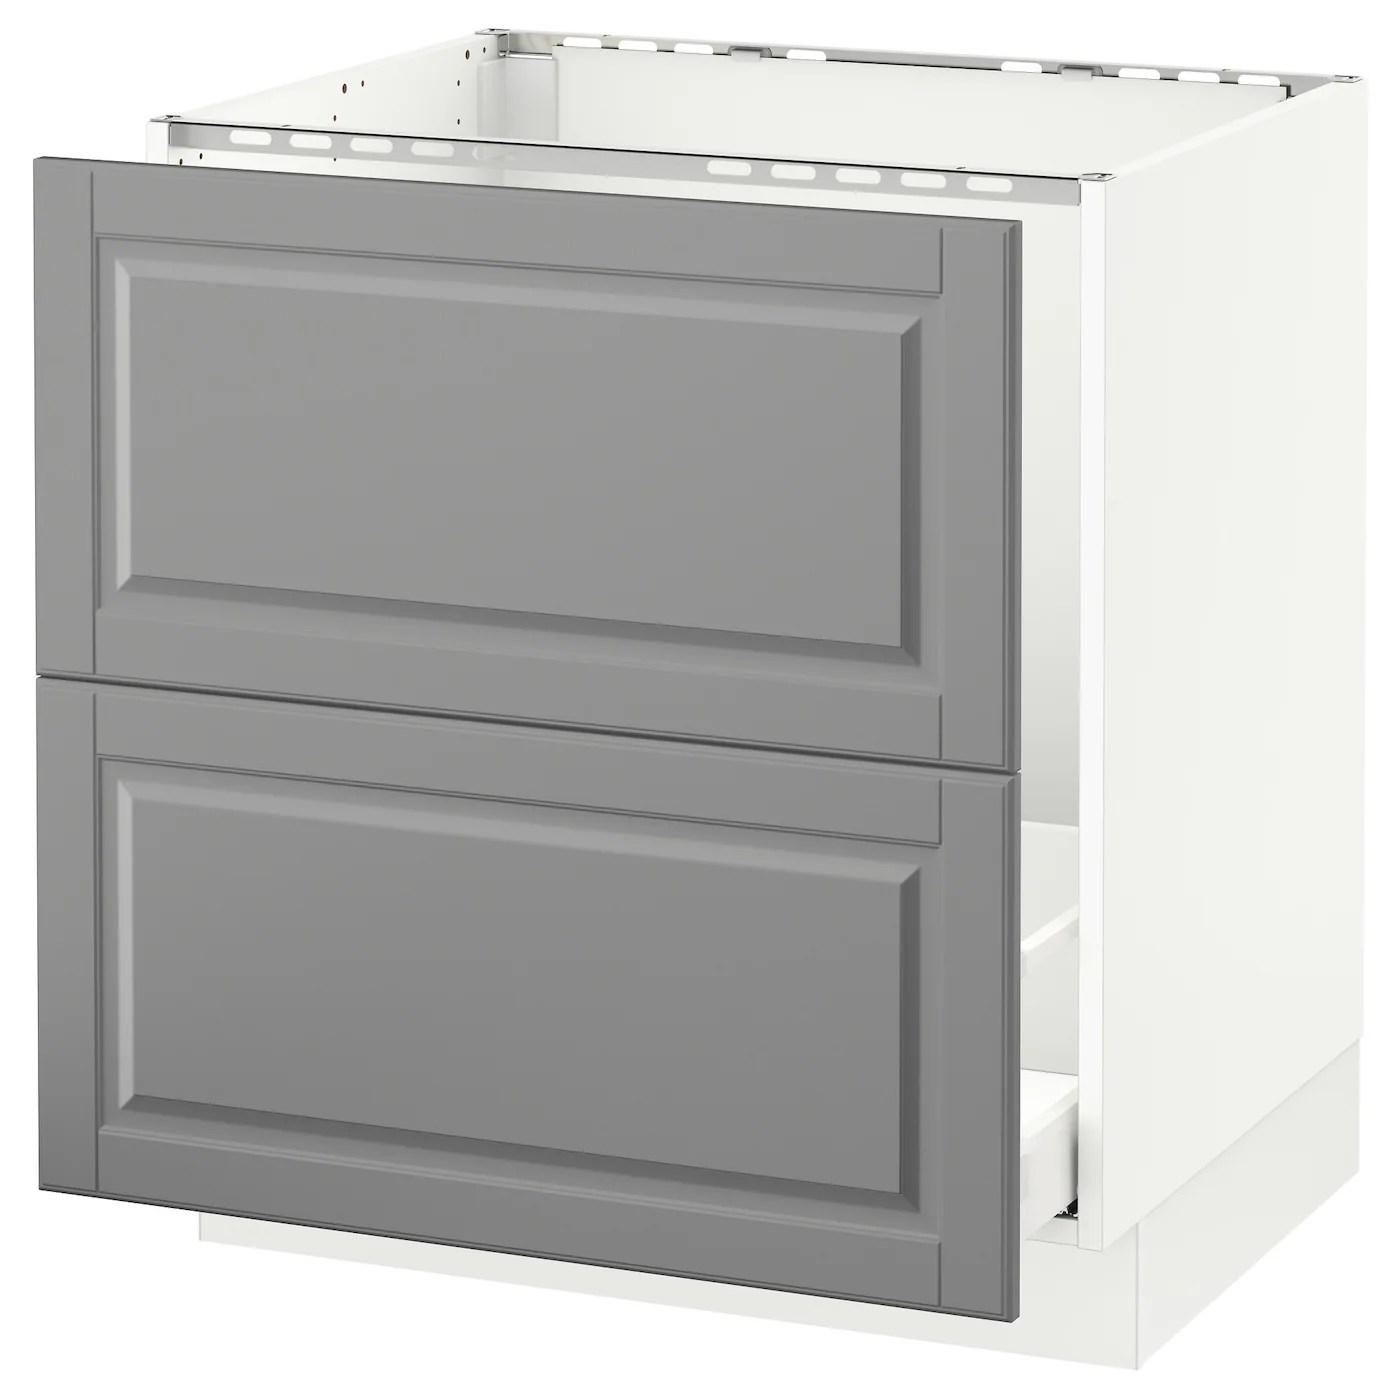 sektion base cabinet f sink recycling white maximera bodbyn gray 30x24x30